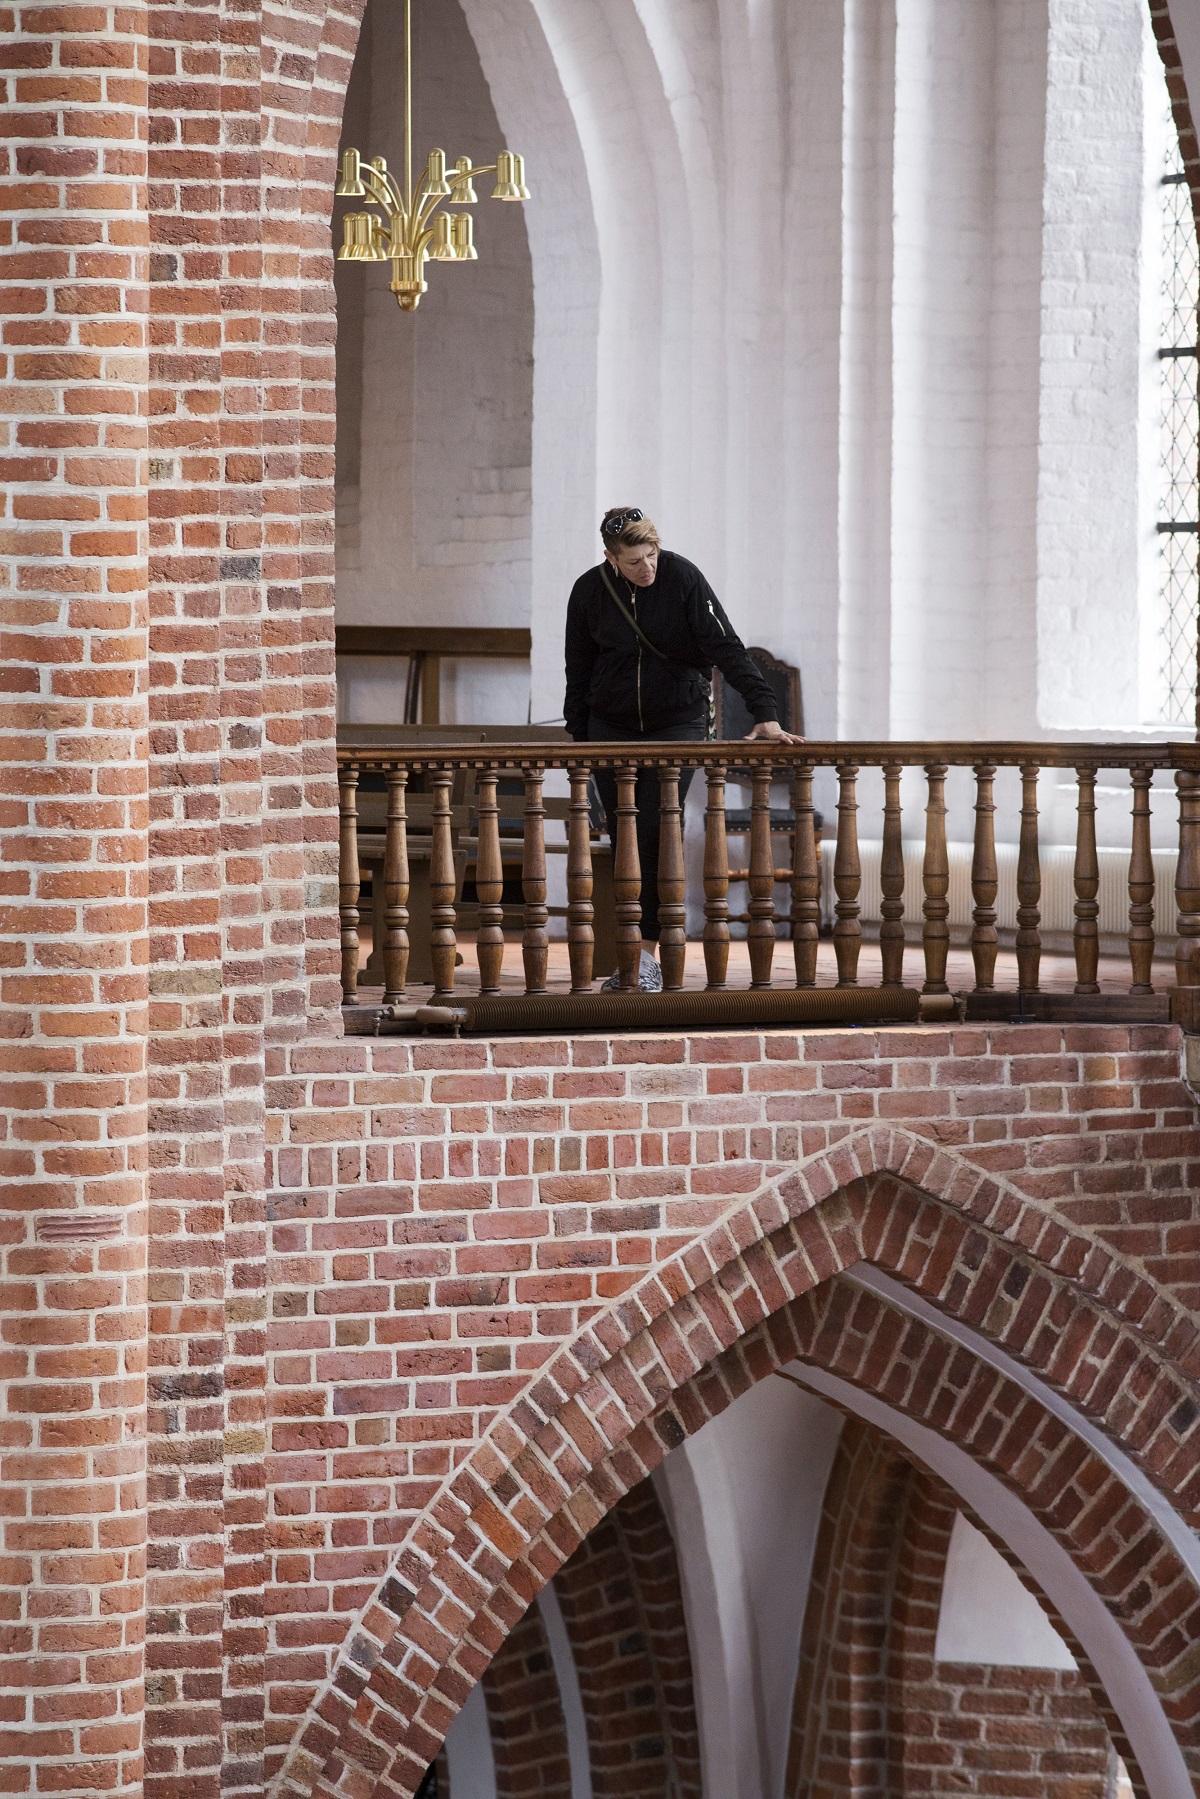 Dom zu Roskilde